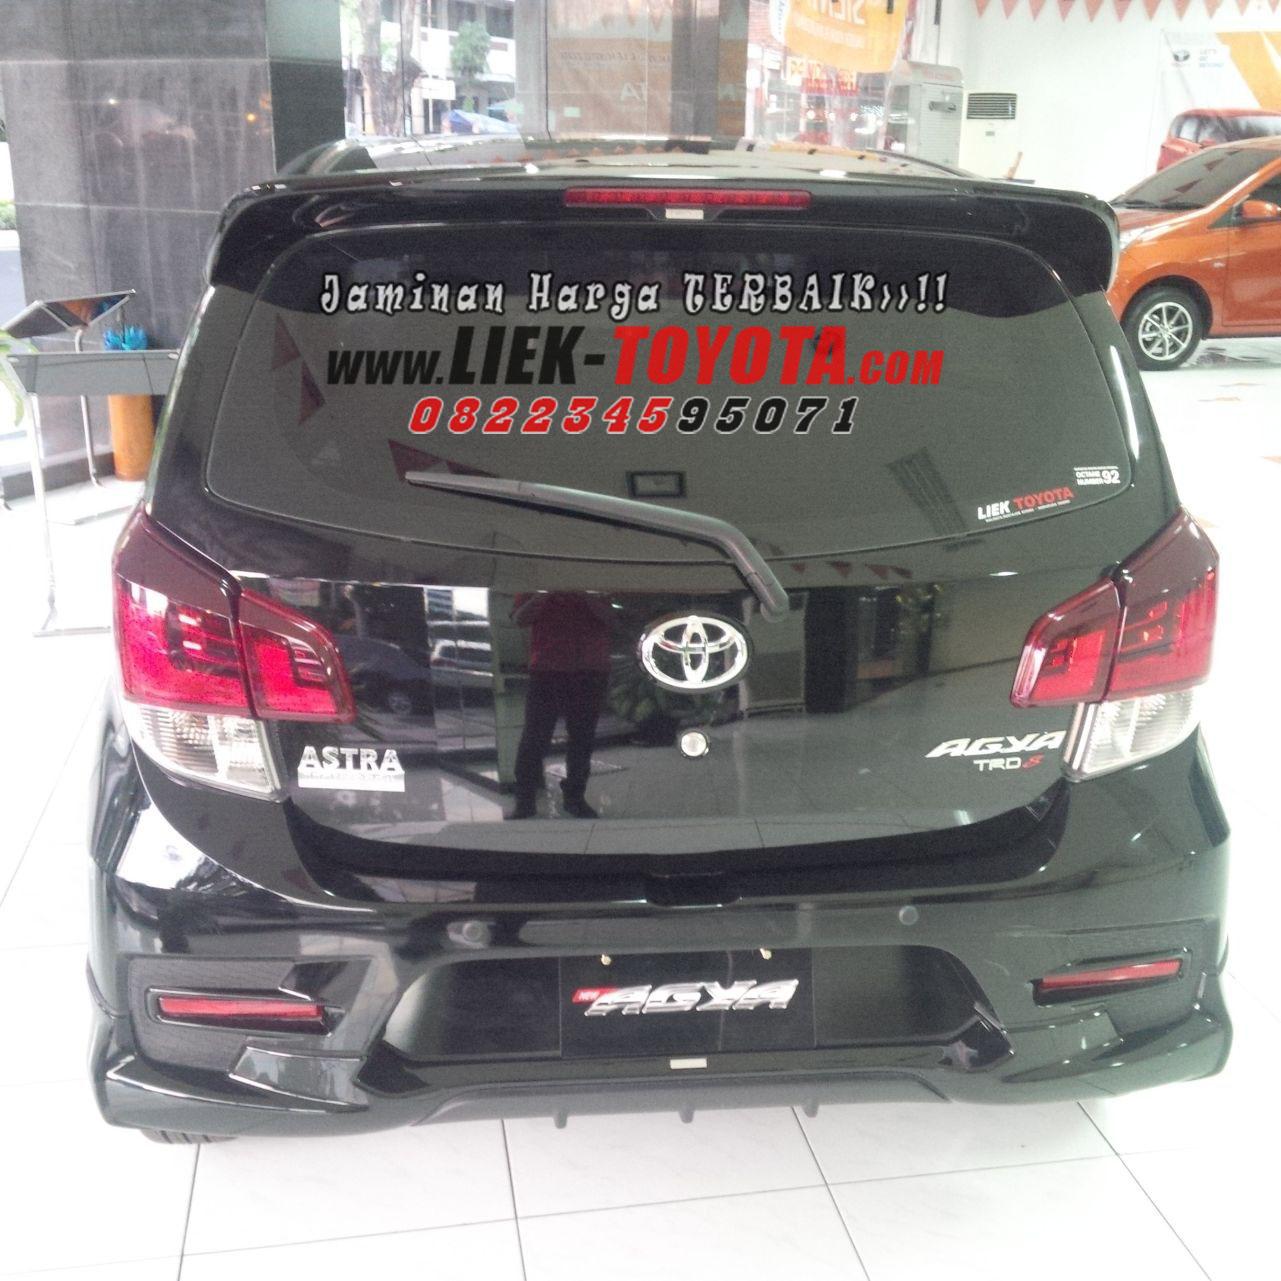 new agya trd hitam all kijang innova bekas harga toyota liek hub 082234595071 g 2017 foto